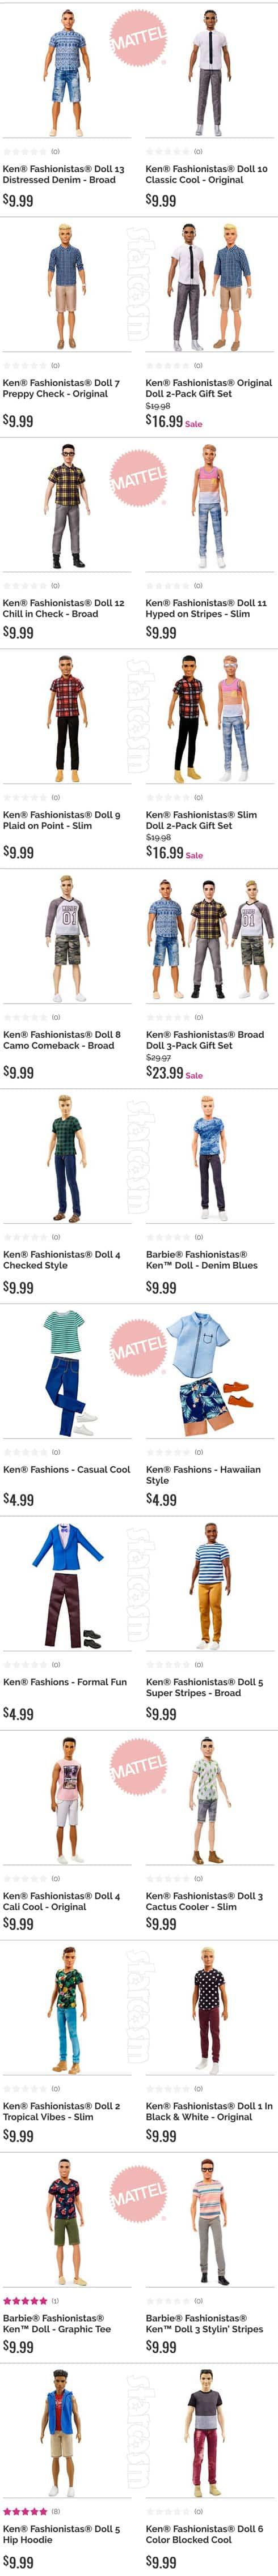 Every Fashionistas Ken doll